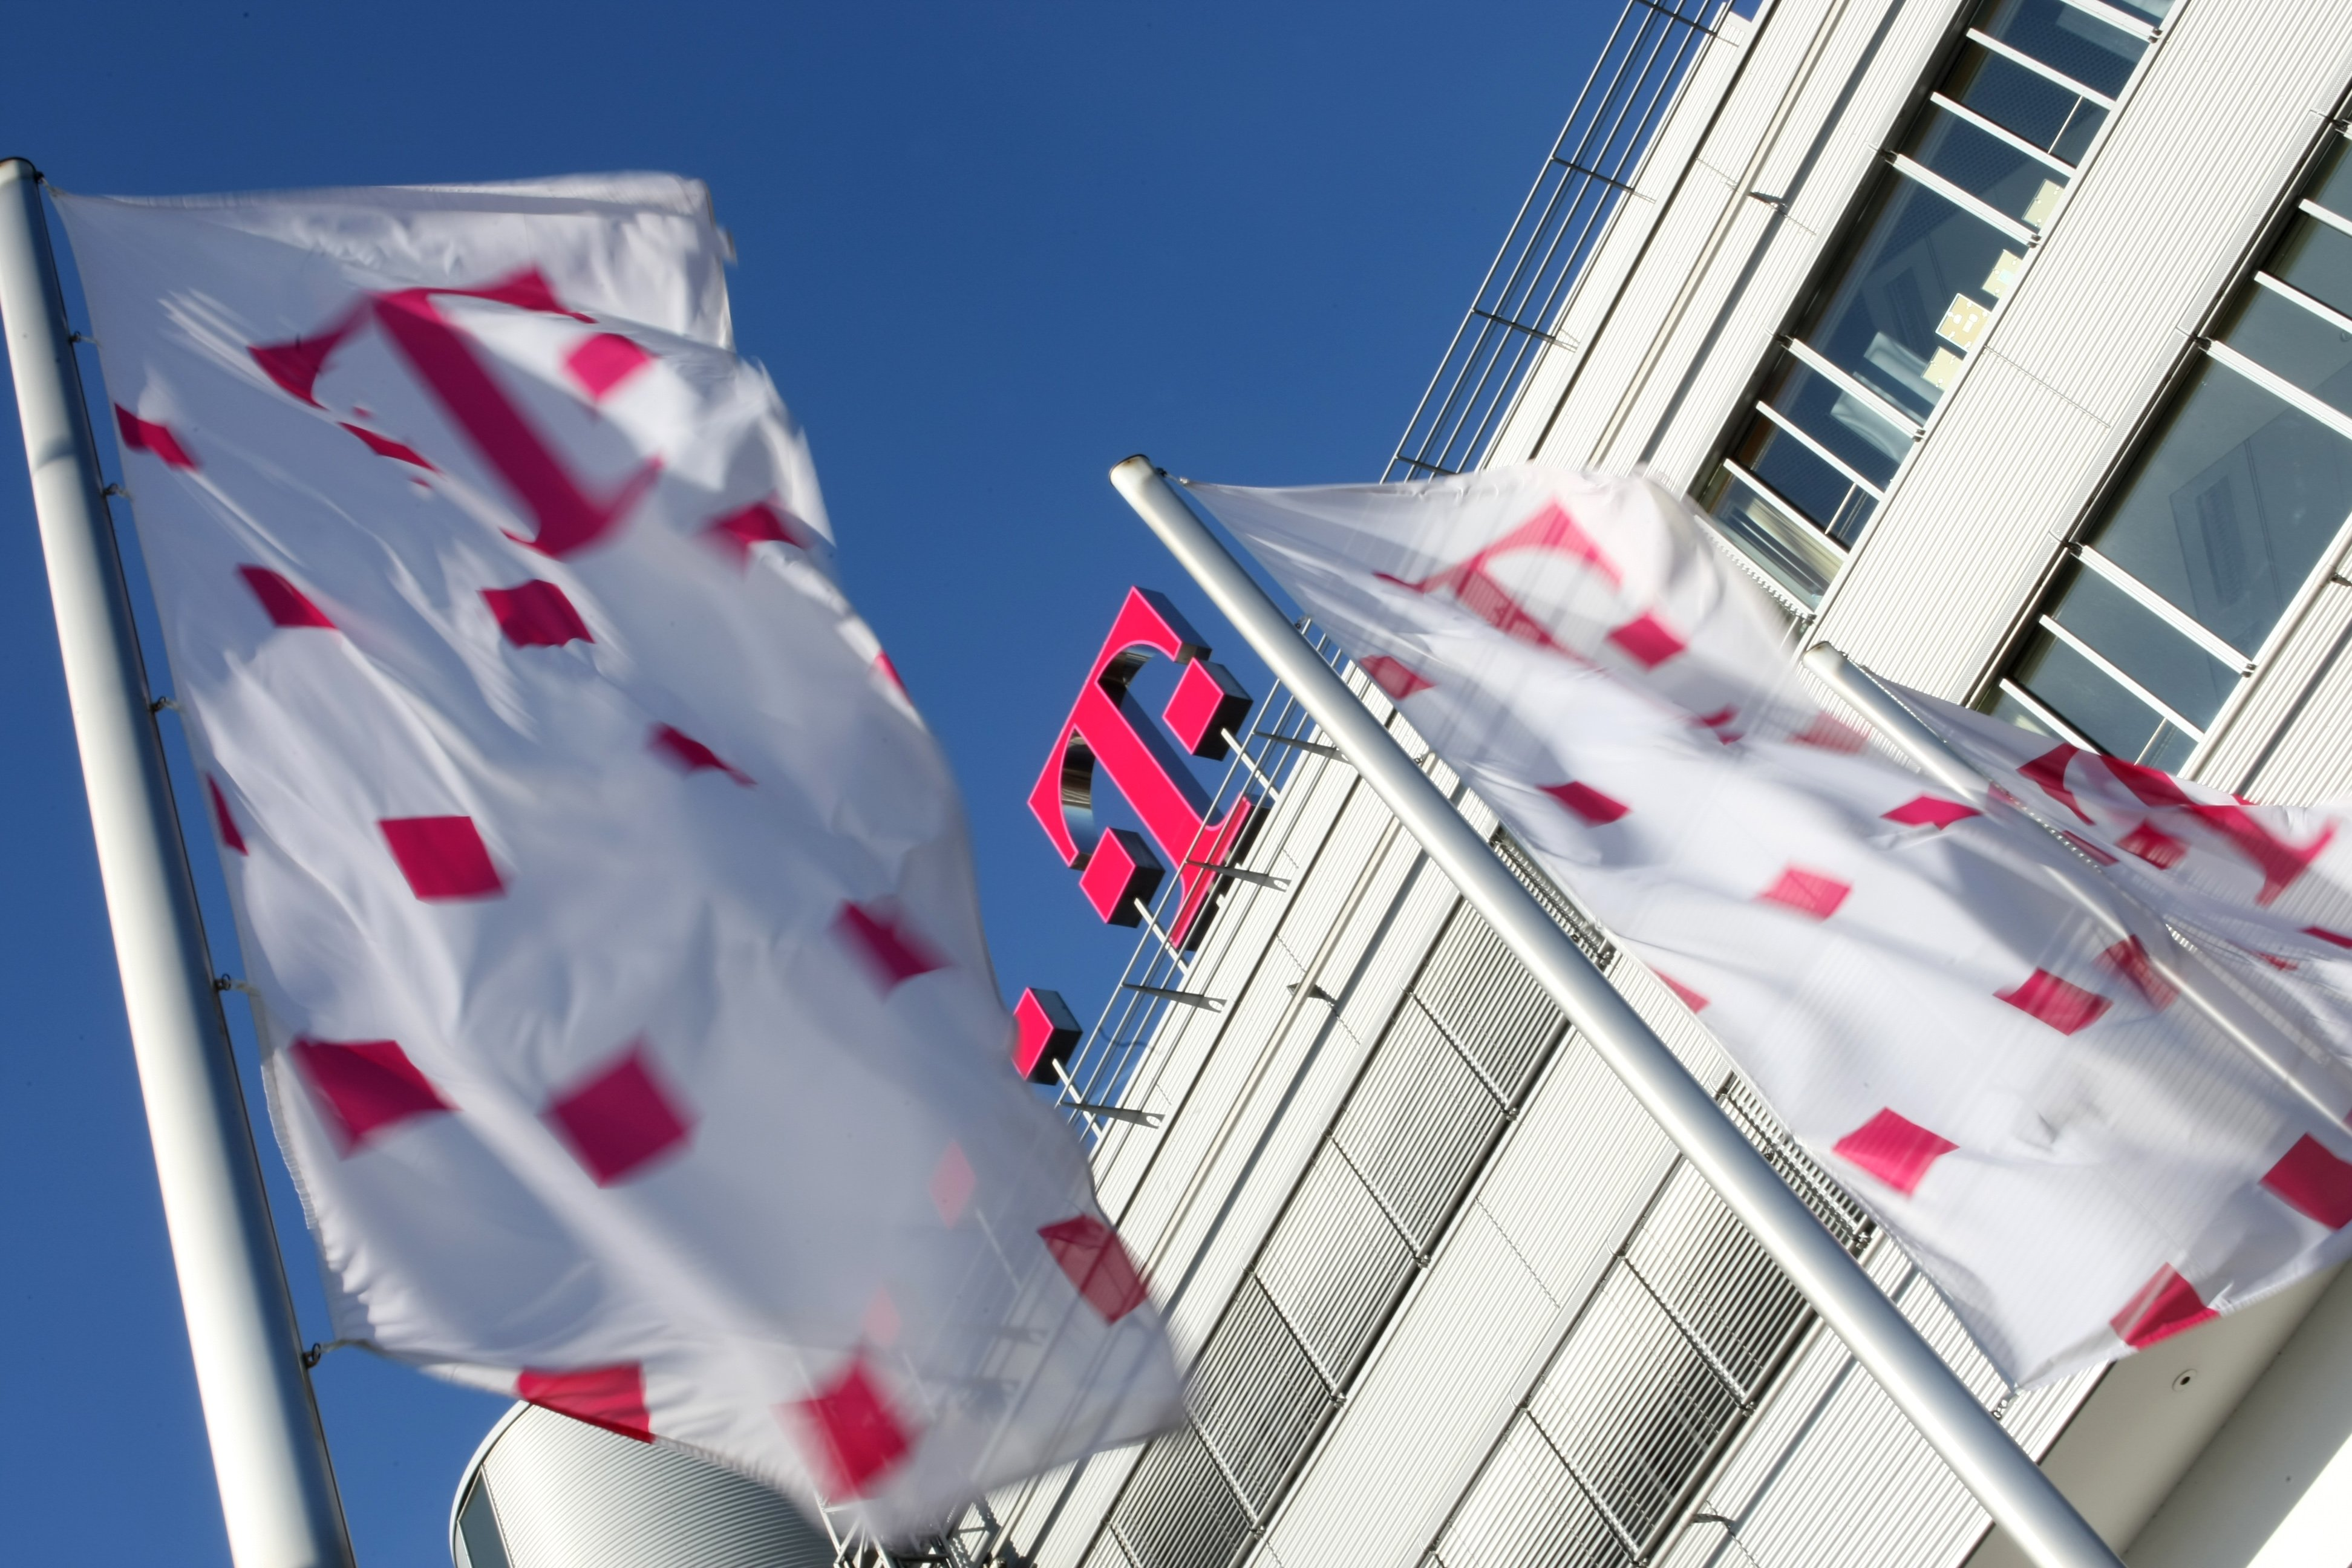 Neuer Telekom Aktions-Tarif MagentaMobil XS: 20 Euro für 3,75 GB Datenvolumen 8